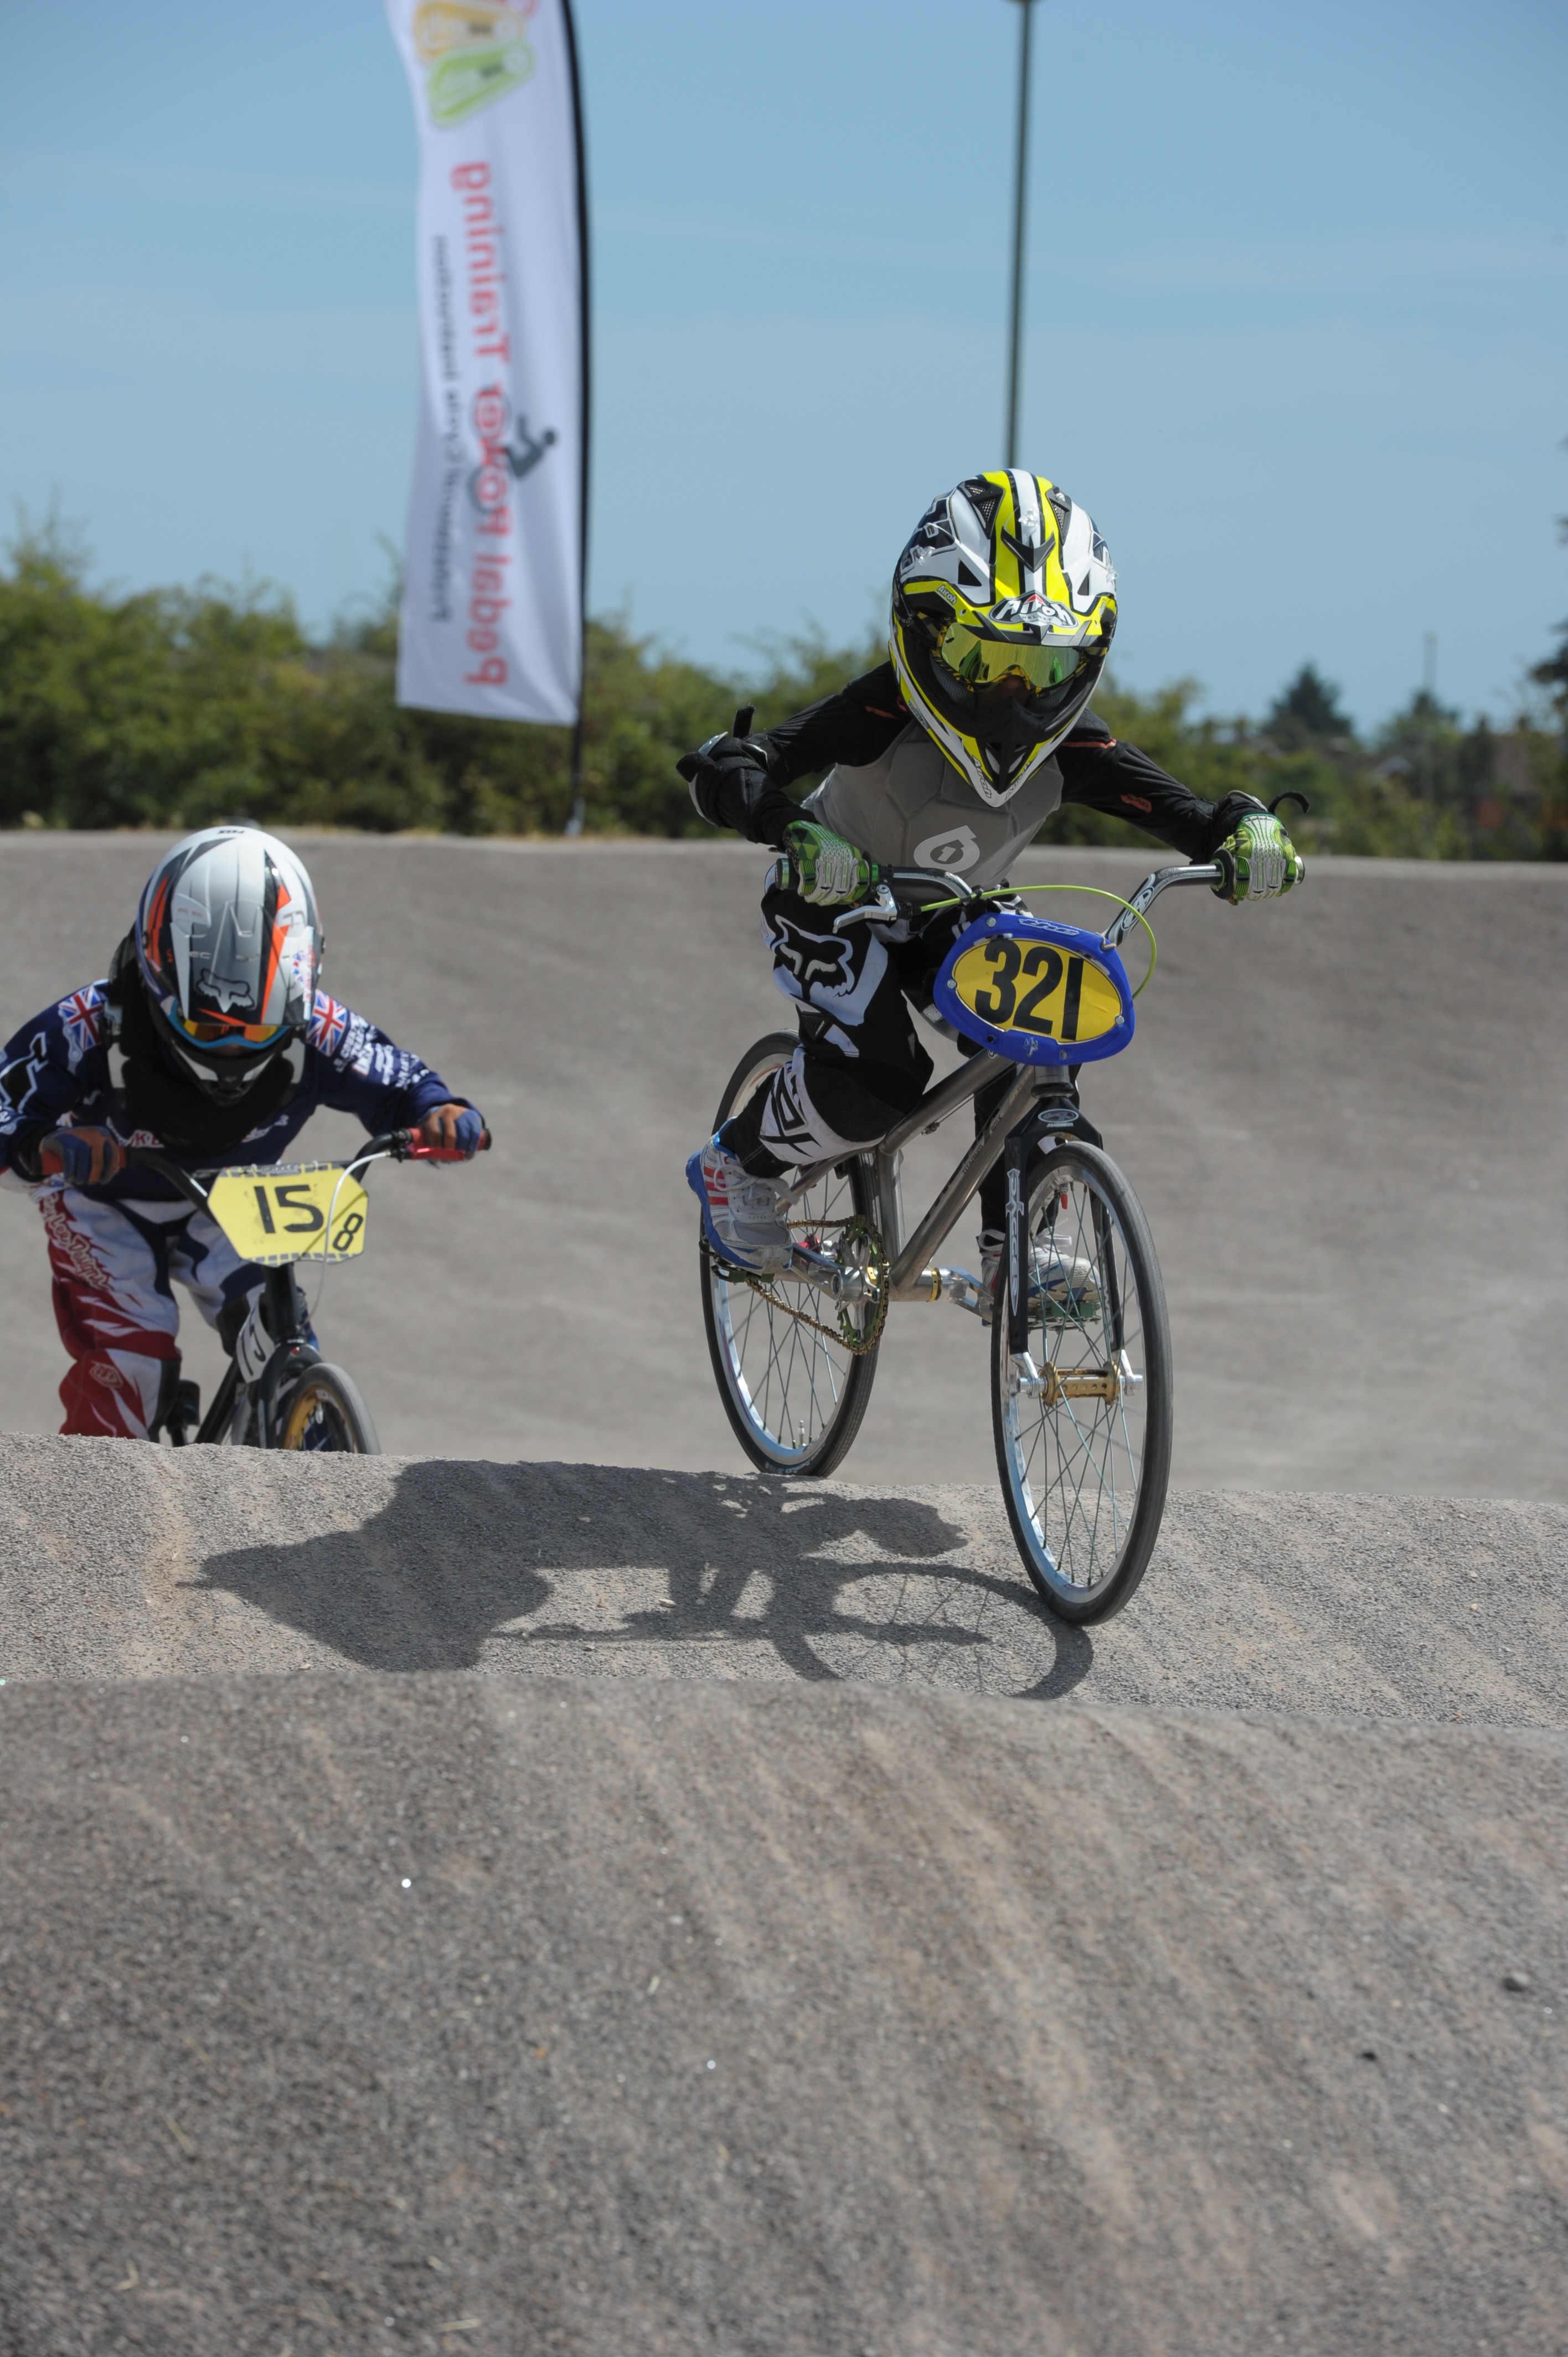 Region BMX Event at Gosport BMX Track